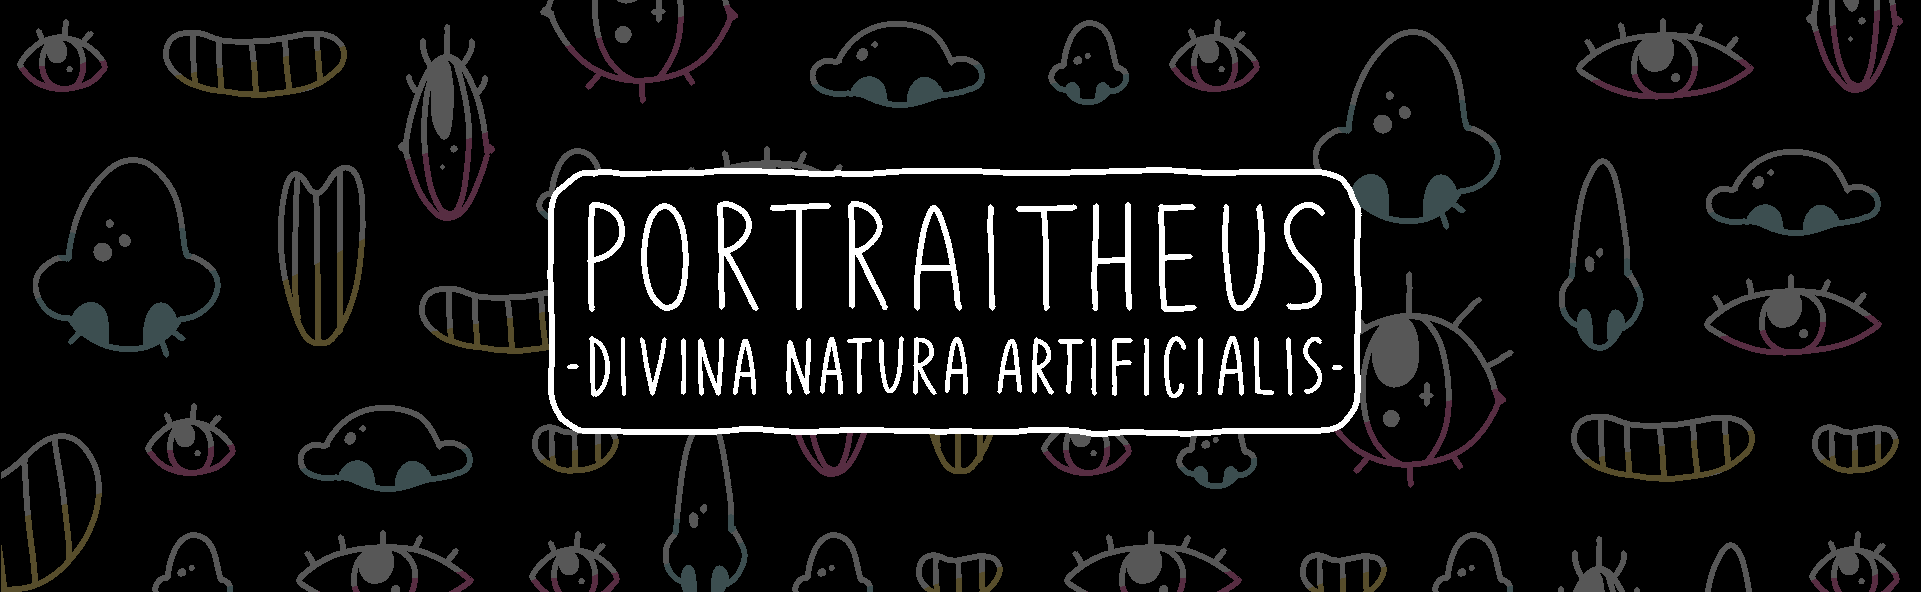 Portraitheus - Divina Natura Artificialis